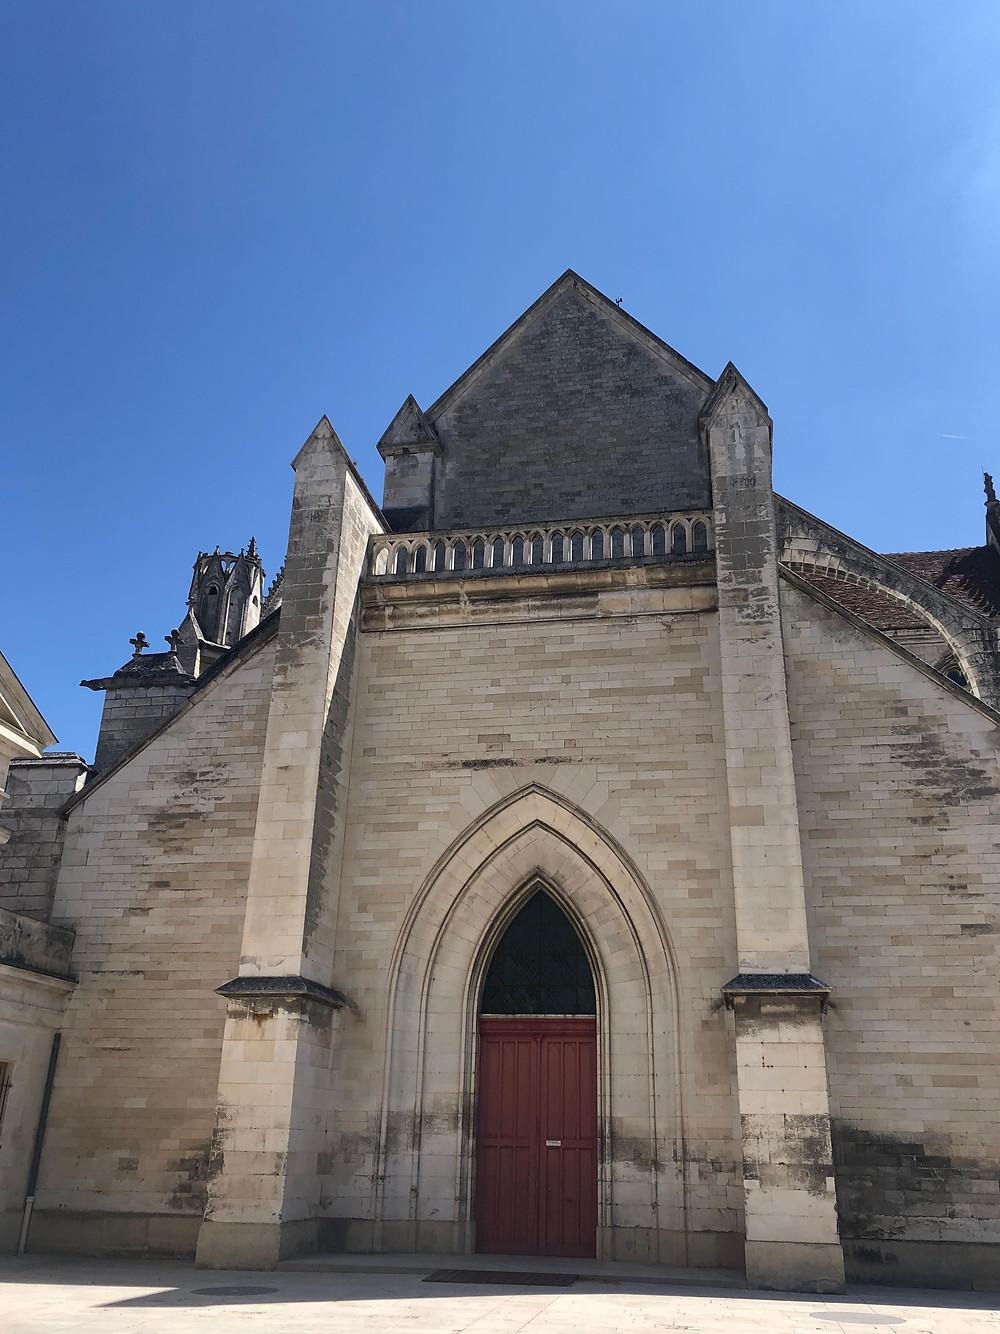 Saint-Germain abbey facade in Auxerre Chablis wine region Burgundy France